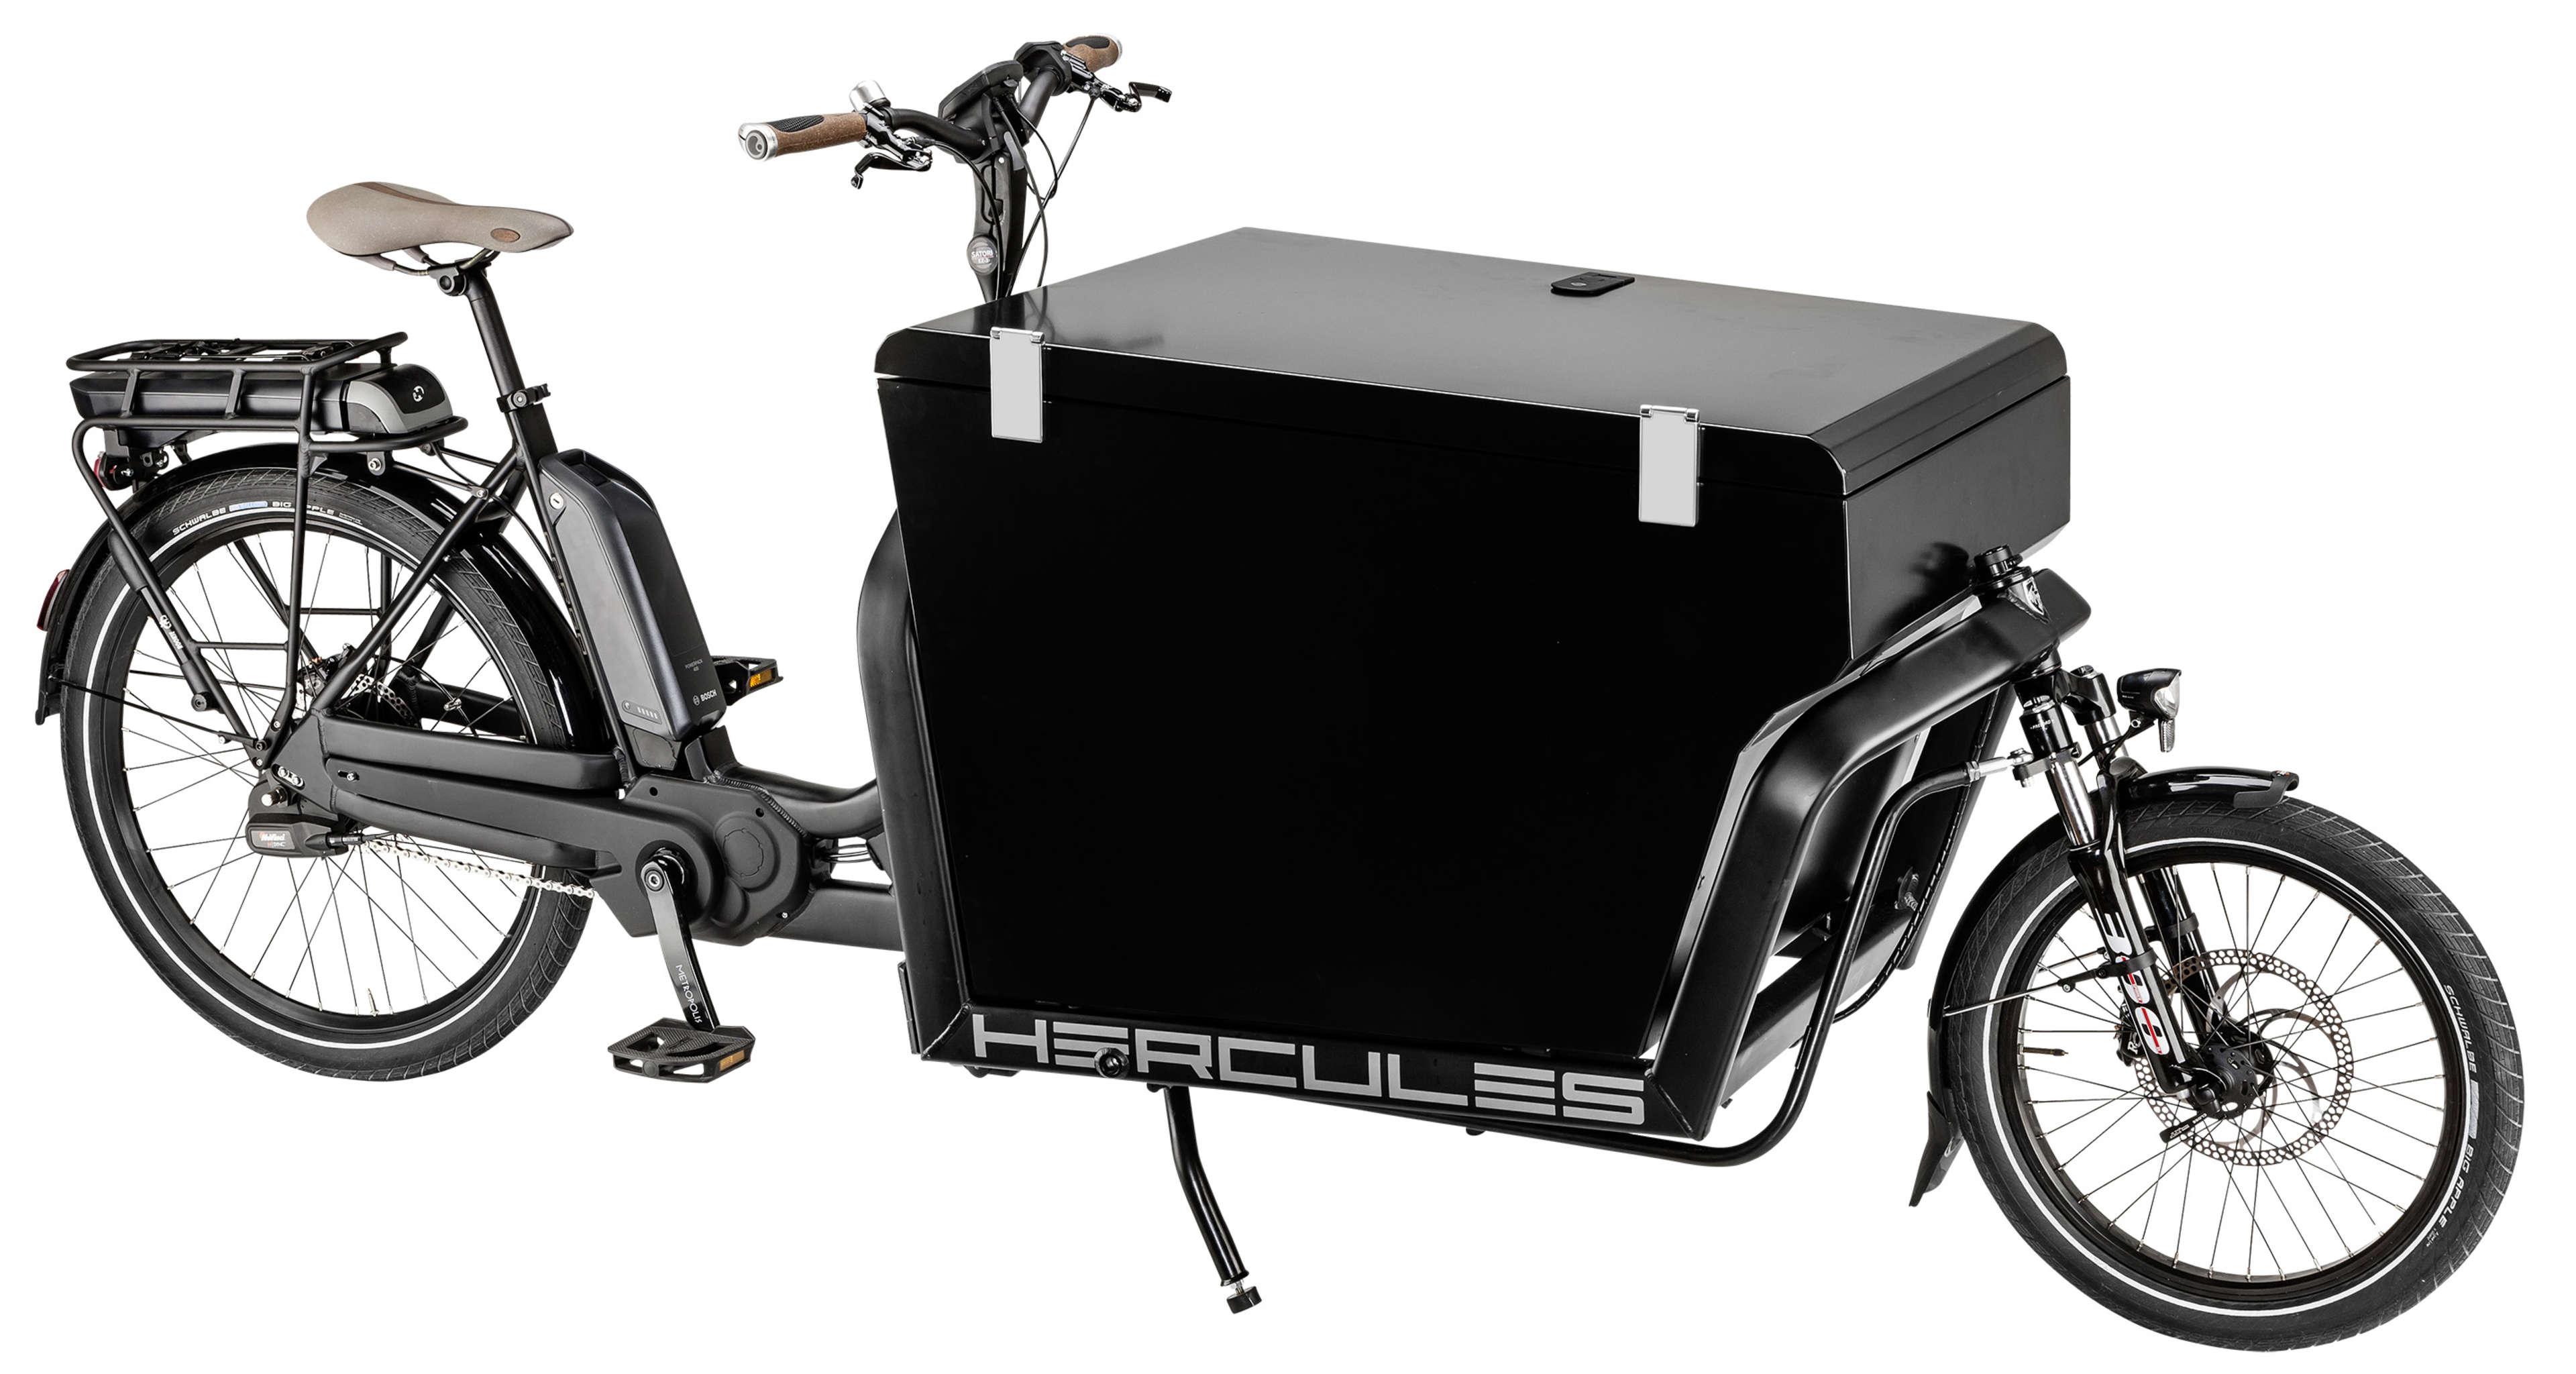 hercules e bike cargo 1000 eurorad bikeleasingeurorad. Black Bedroom Furniture Sets. Home Design Ideas